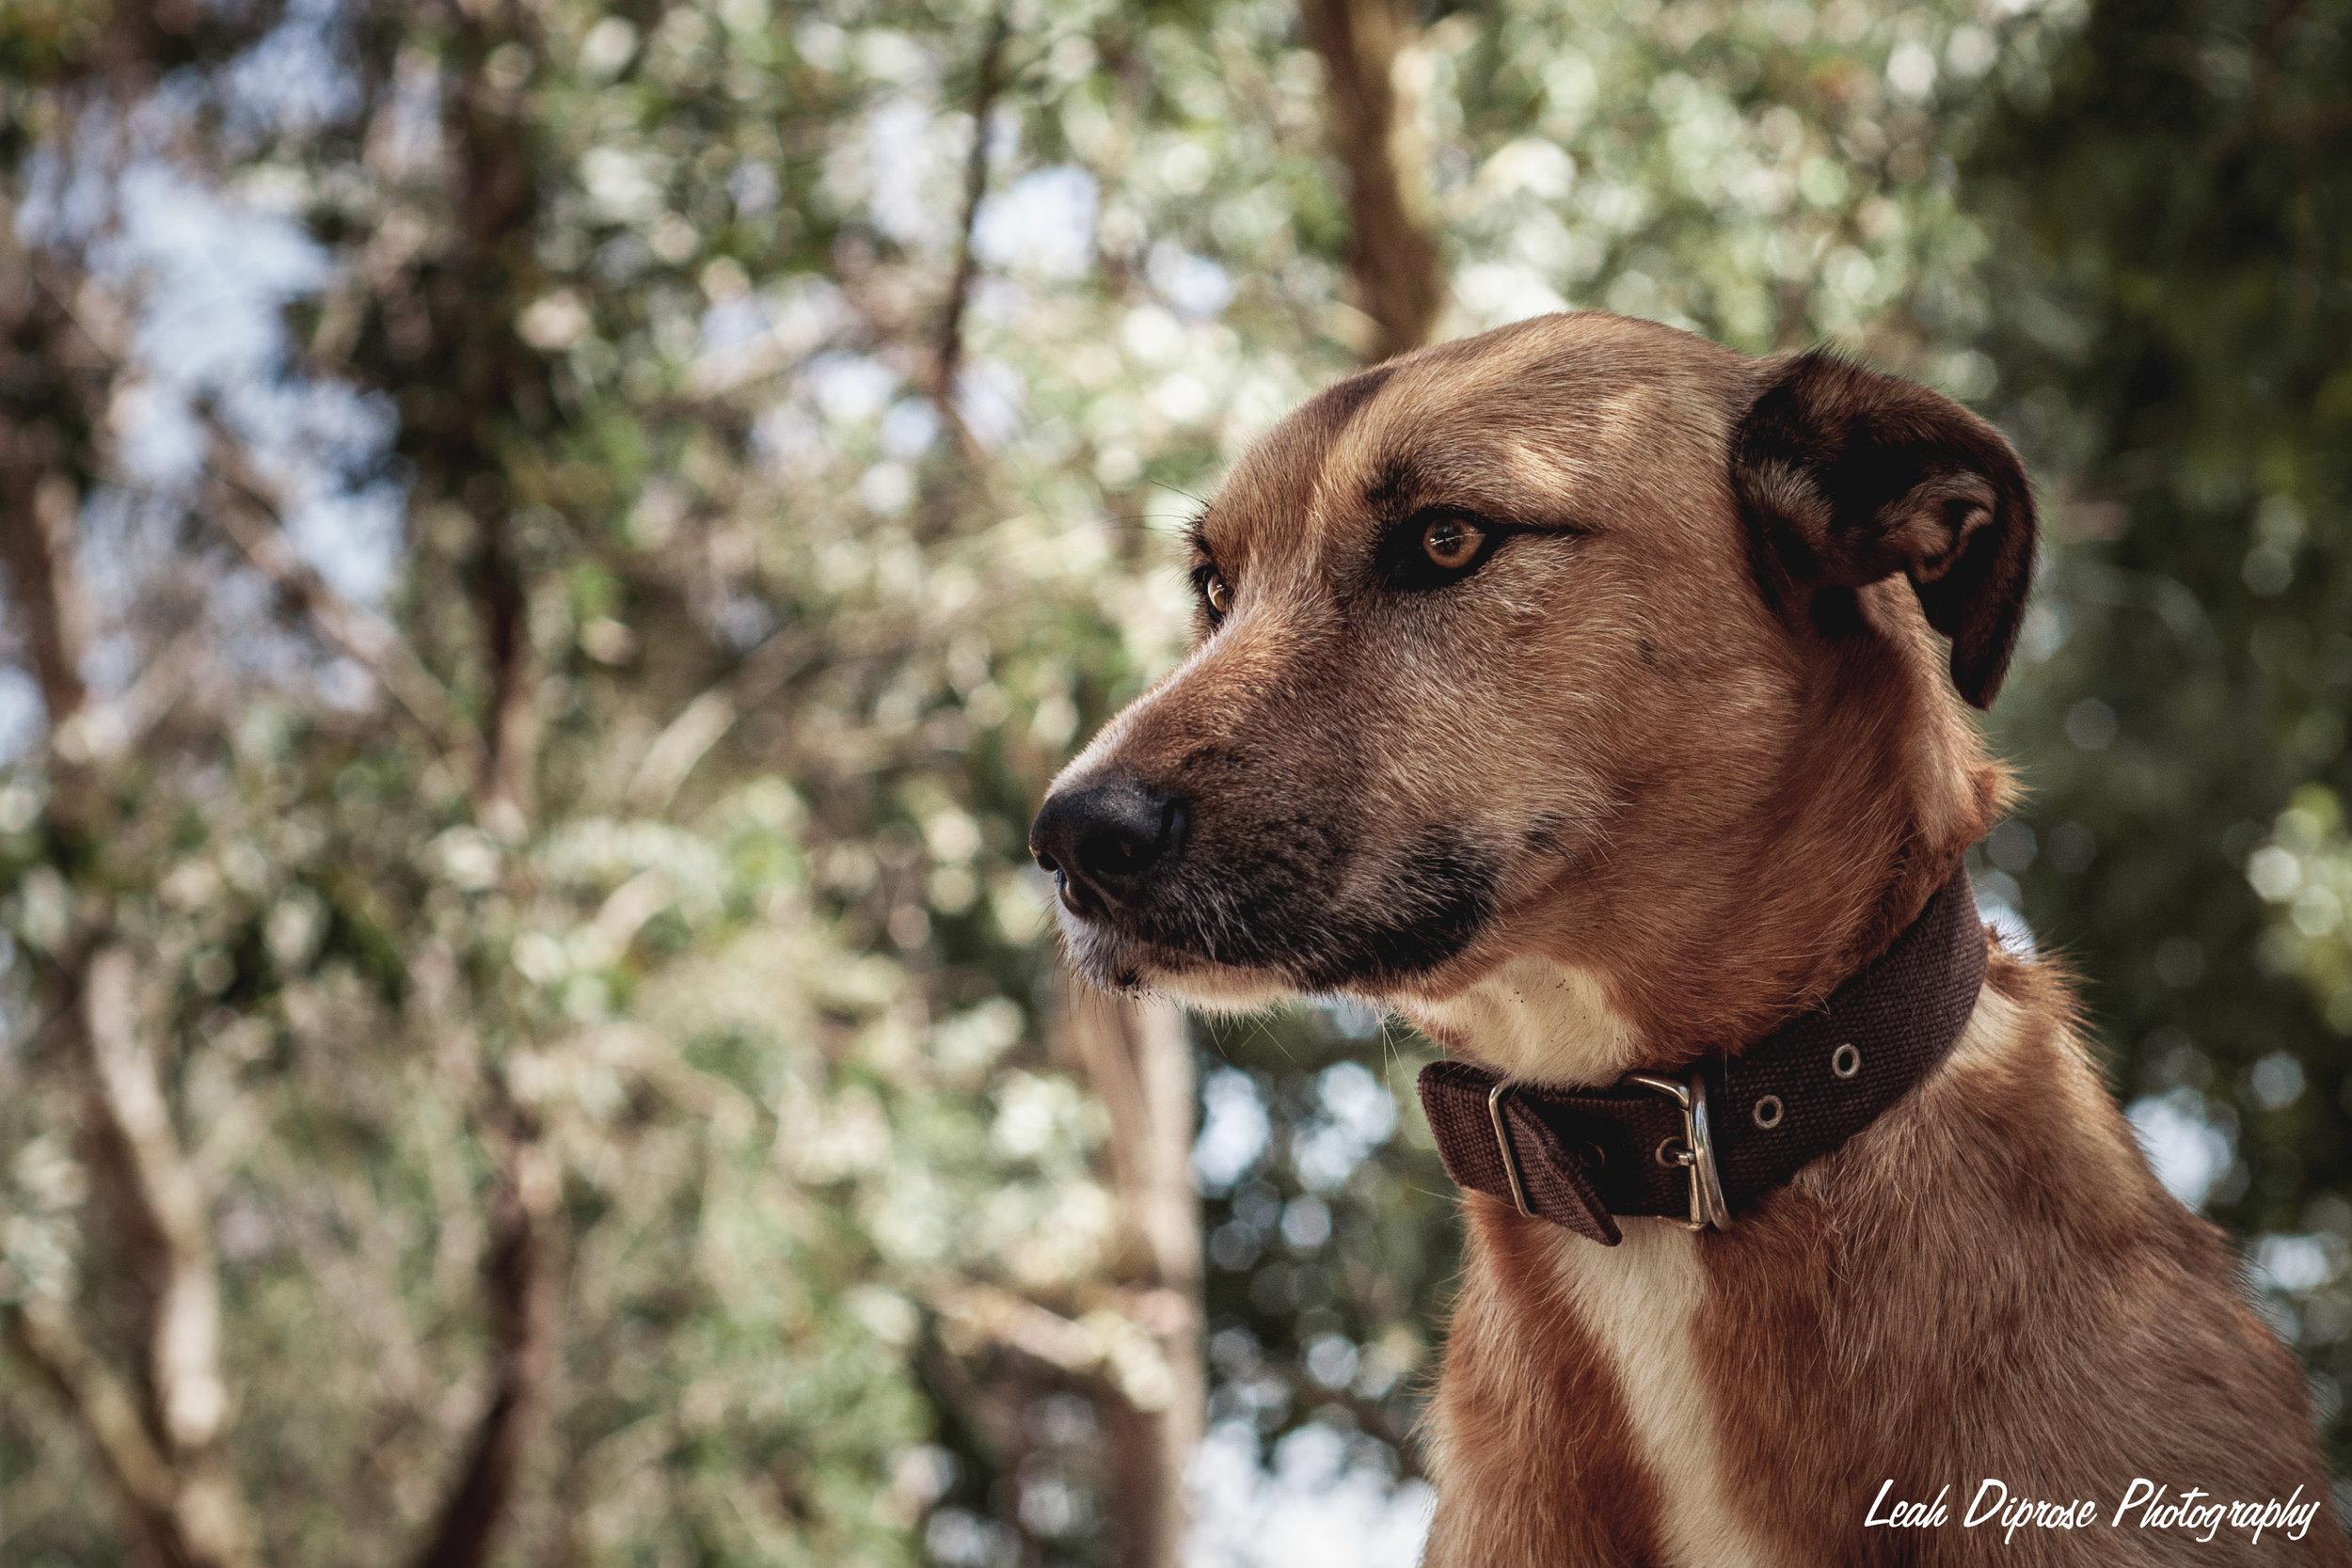 Leah Diprose Photography image-6218.jpg